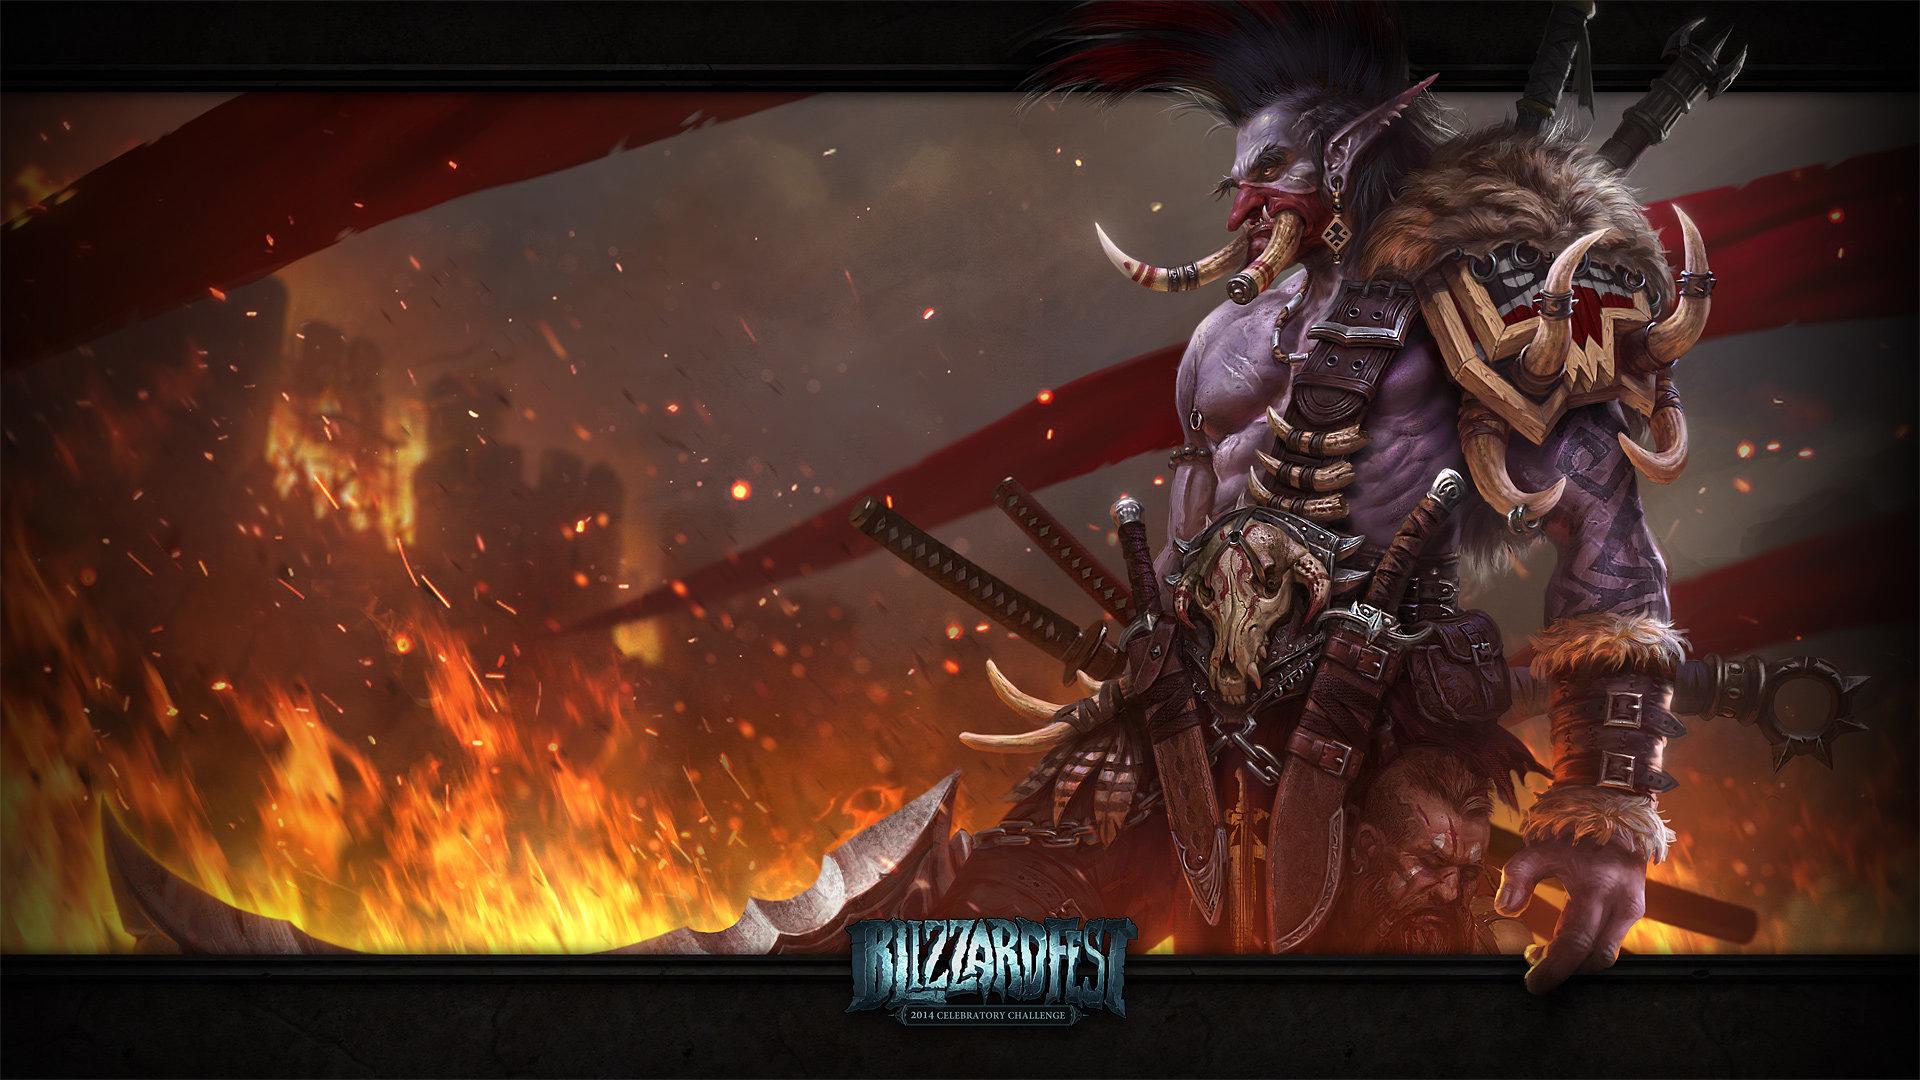 World Of Warcraft Backgrounds 1920x1080: WOW Troll Wallpaper